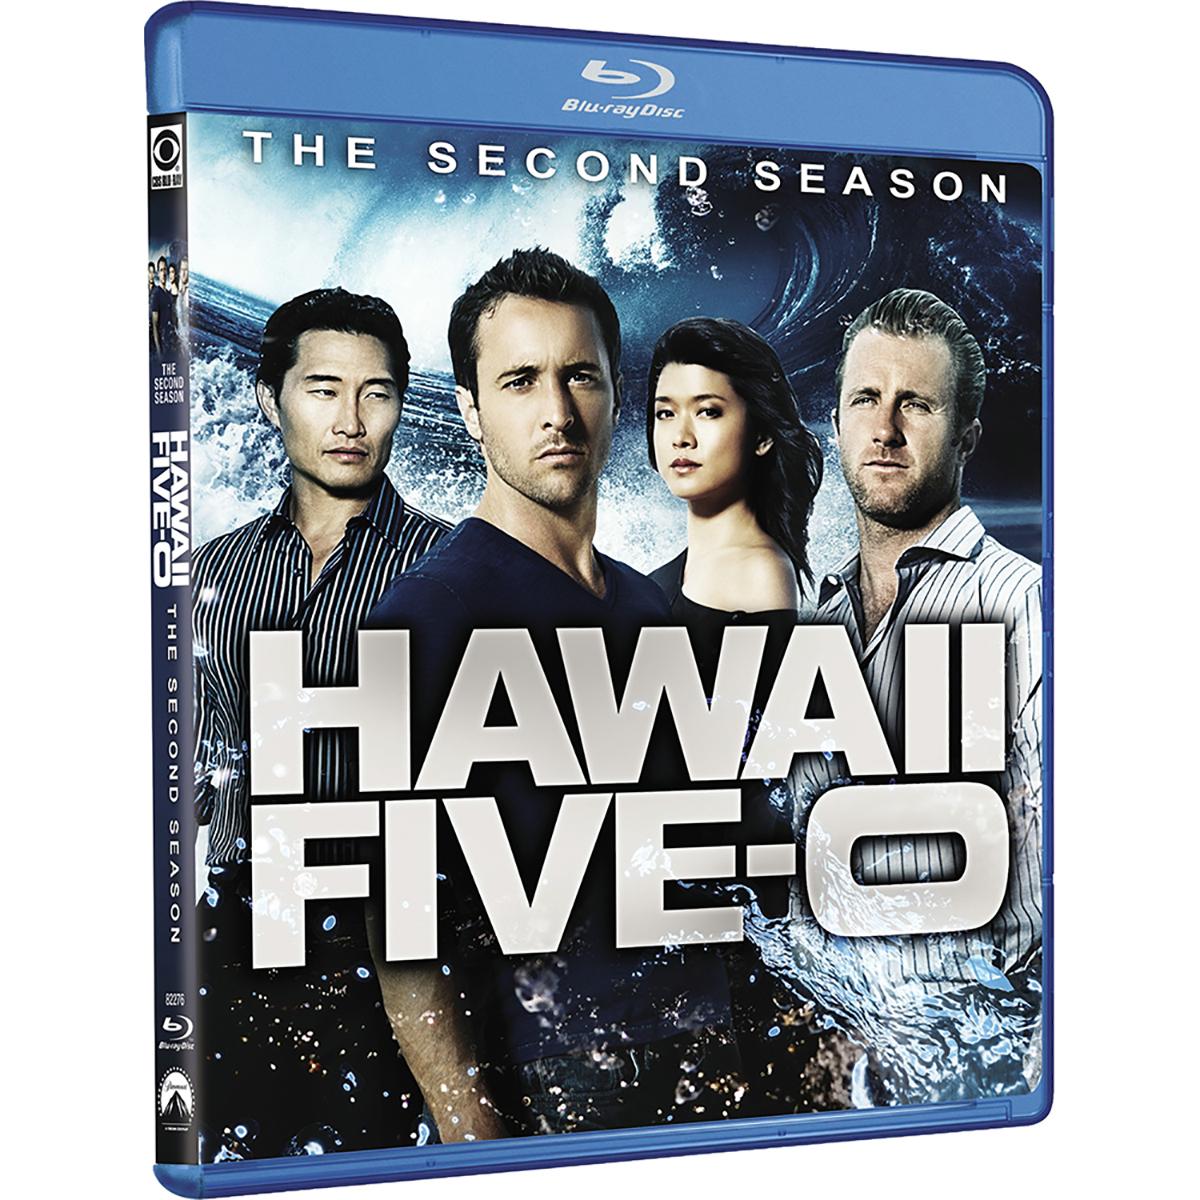 Hawaii Five-O (2011): Season 2 Blu-ray -  DVDs & Videos 2870-374926